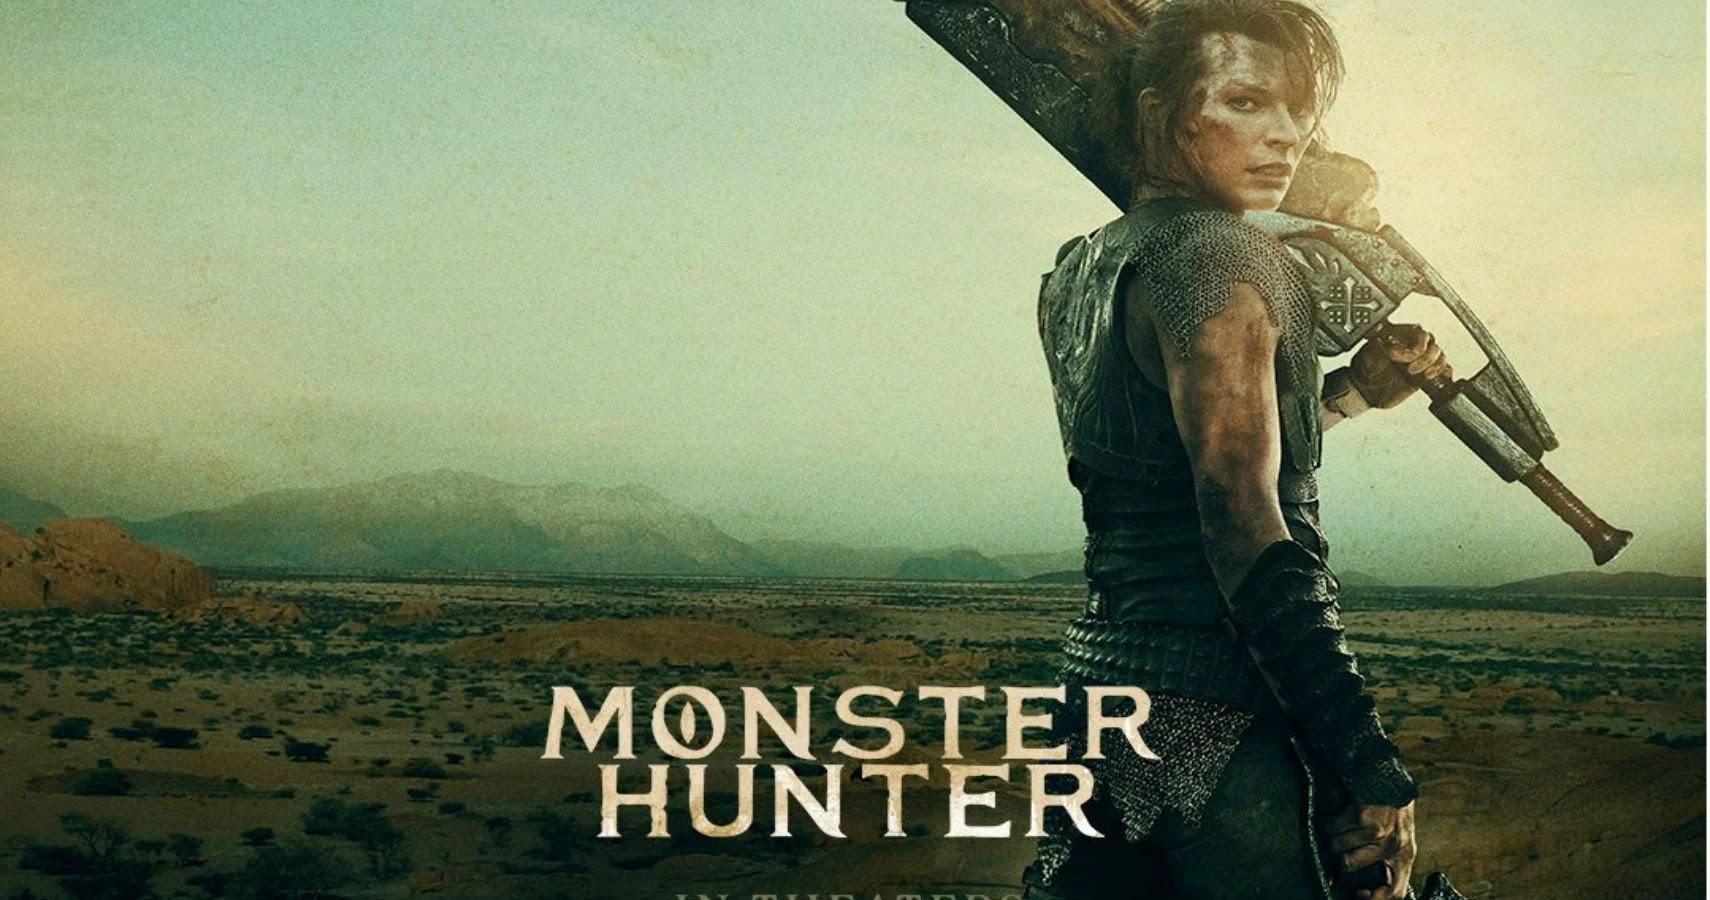 First short trailer for Monster Hunter reveals giant monsters cinema release in 2020